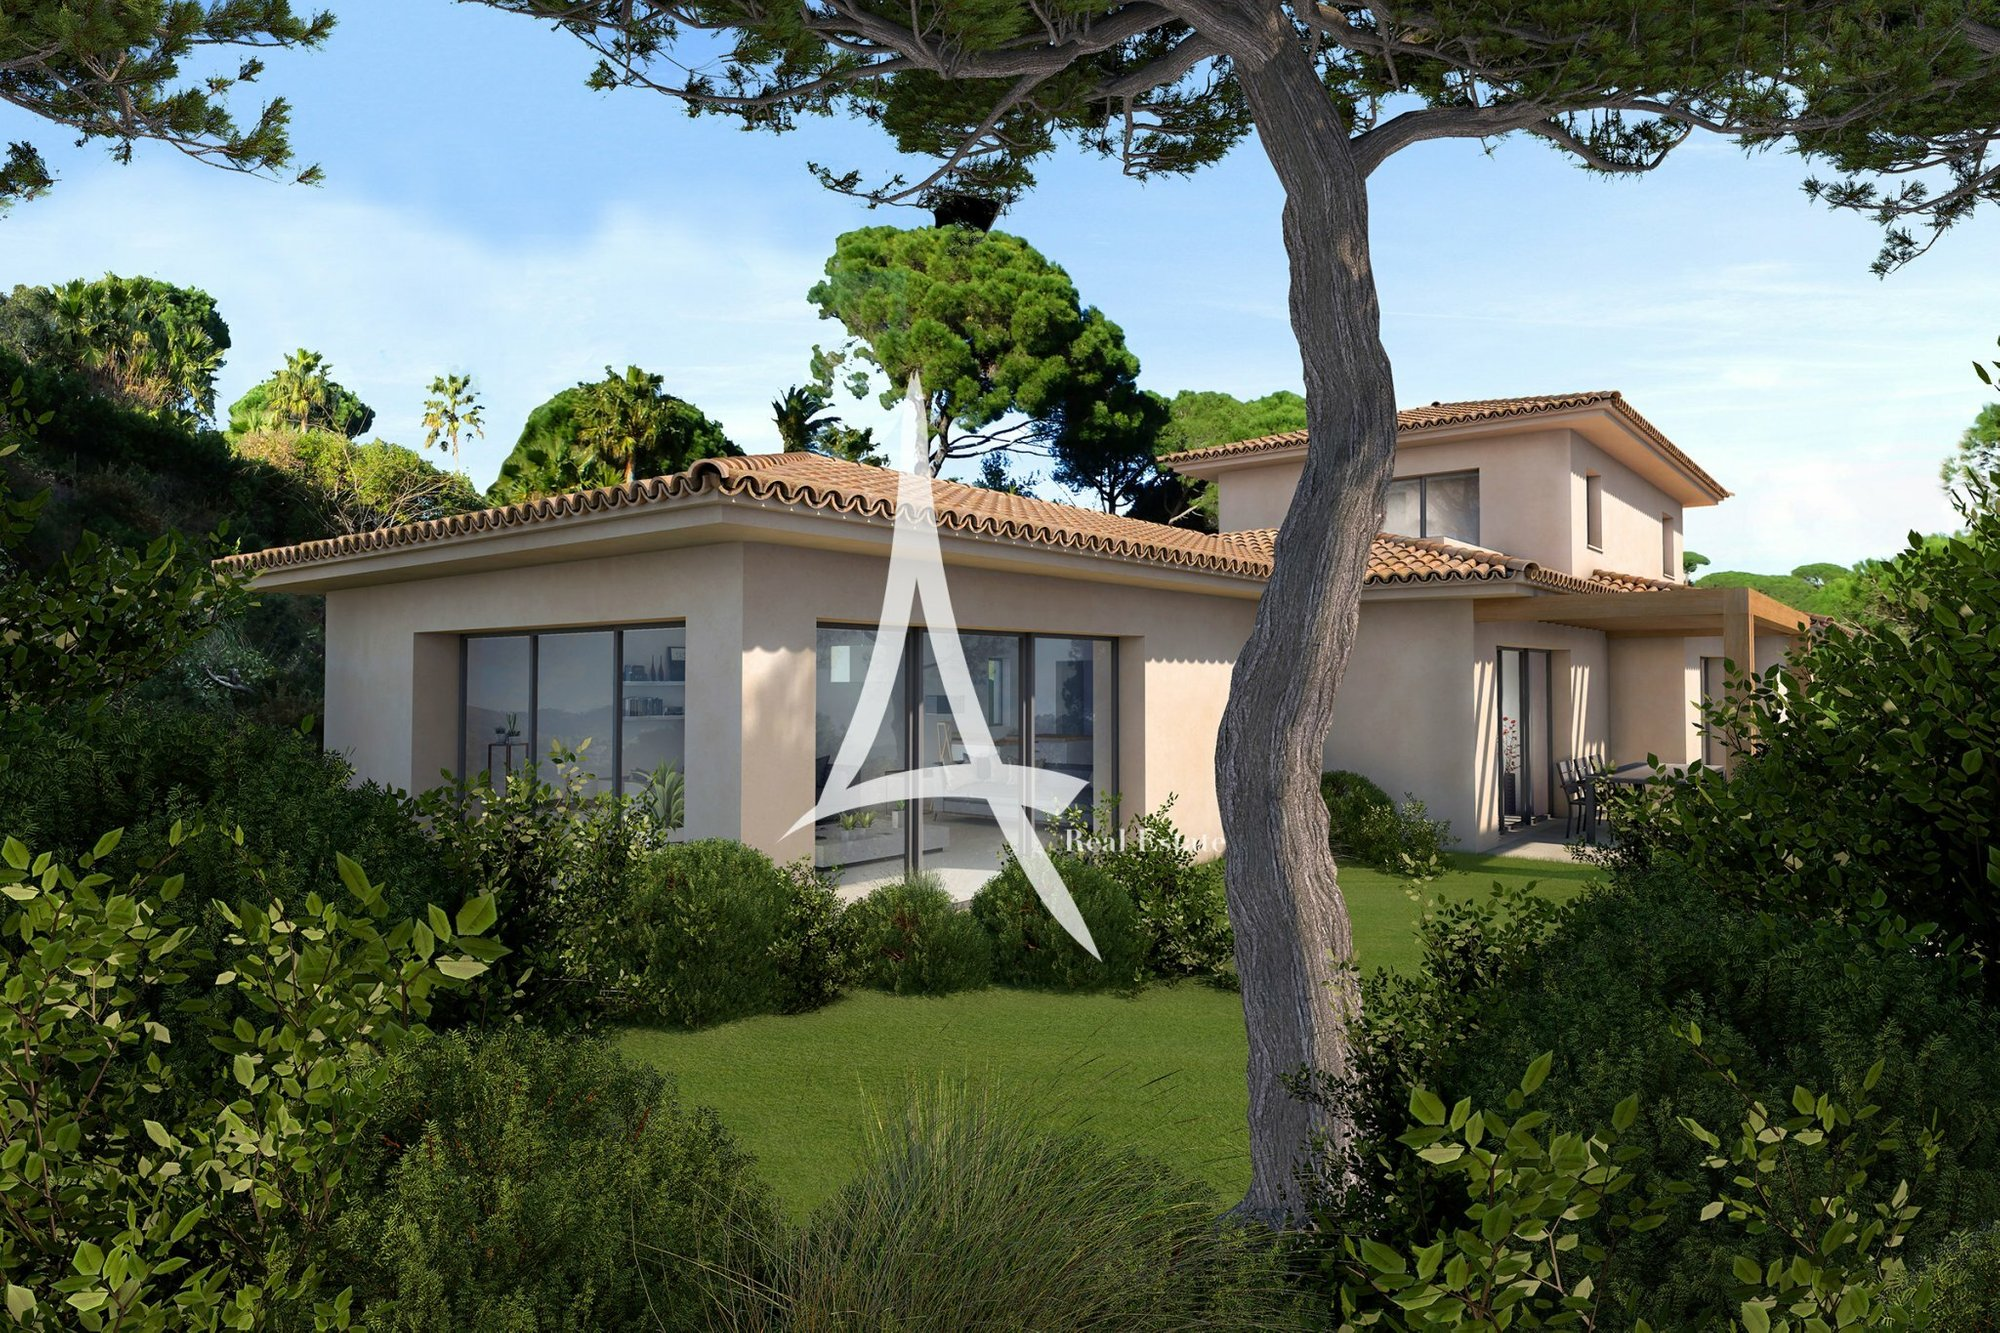 Land in La Croix-Valmer, Provence-Alpes-Côte d'Azur, France 1